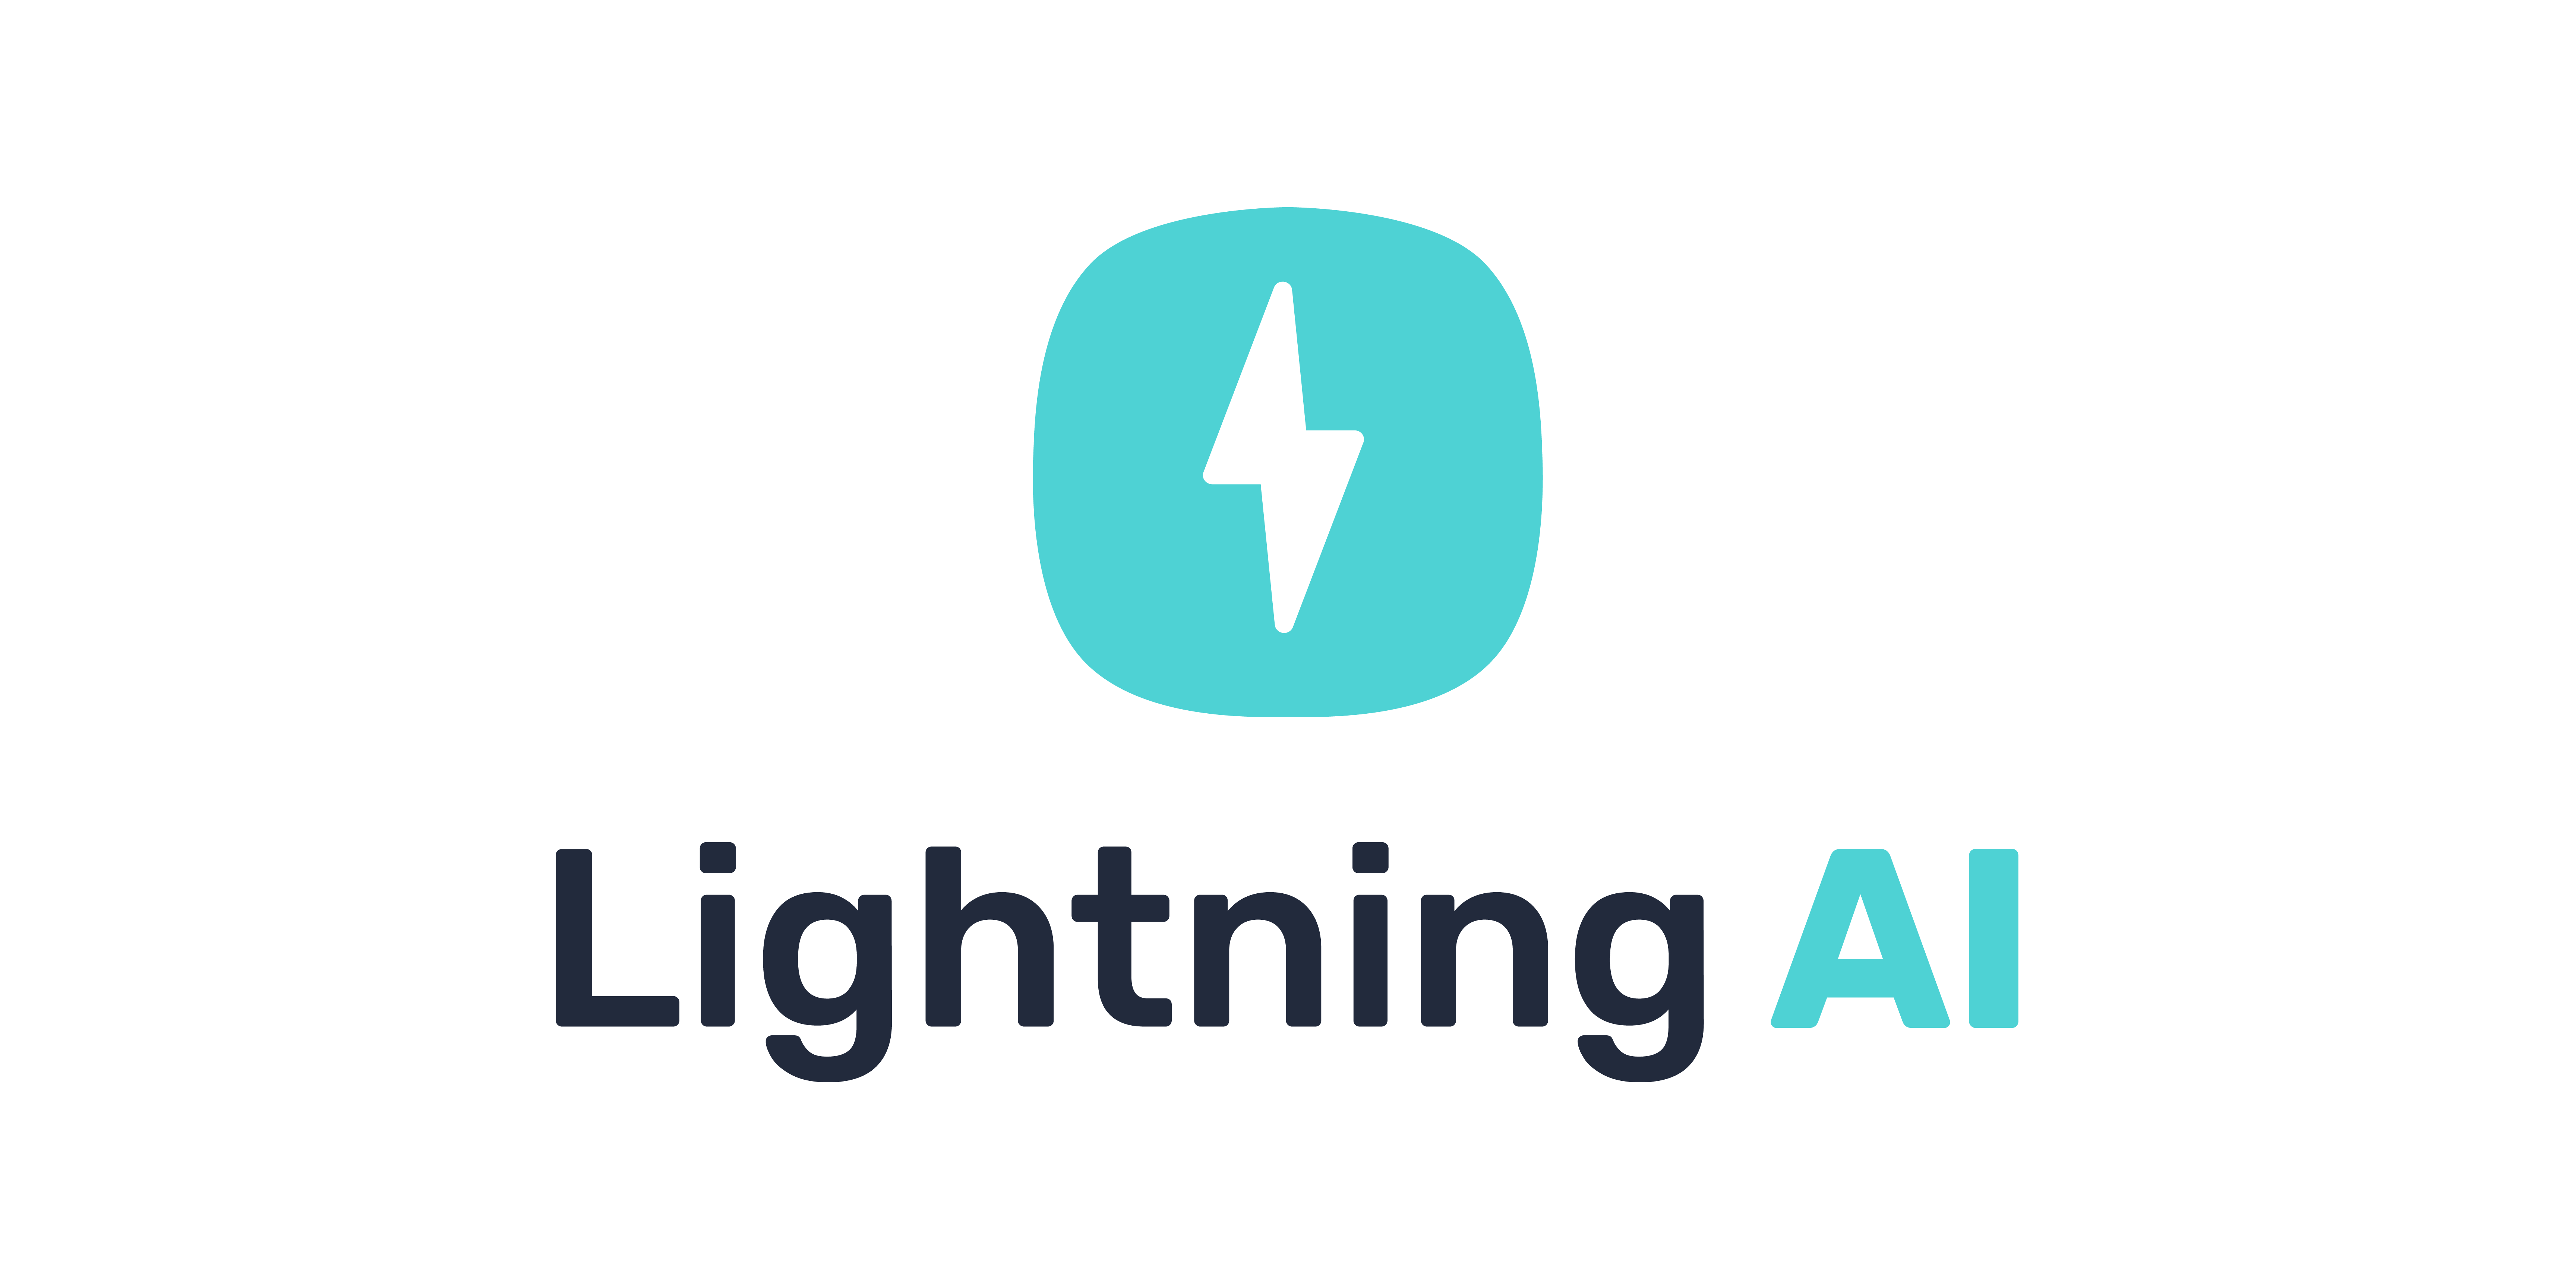 Lightning AI